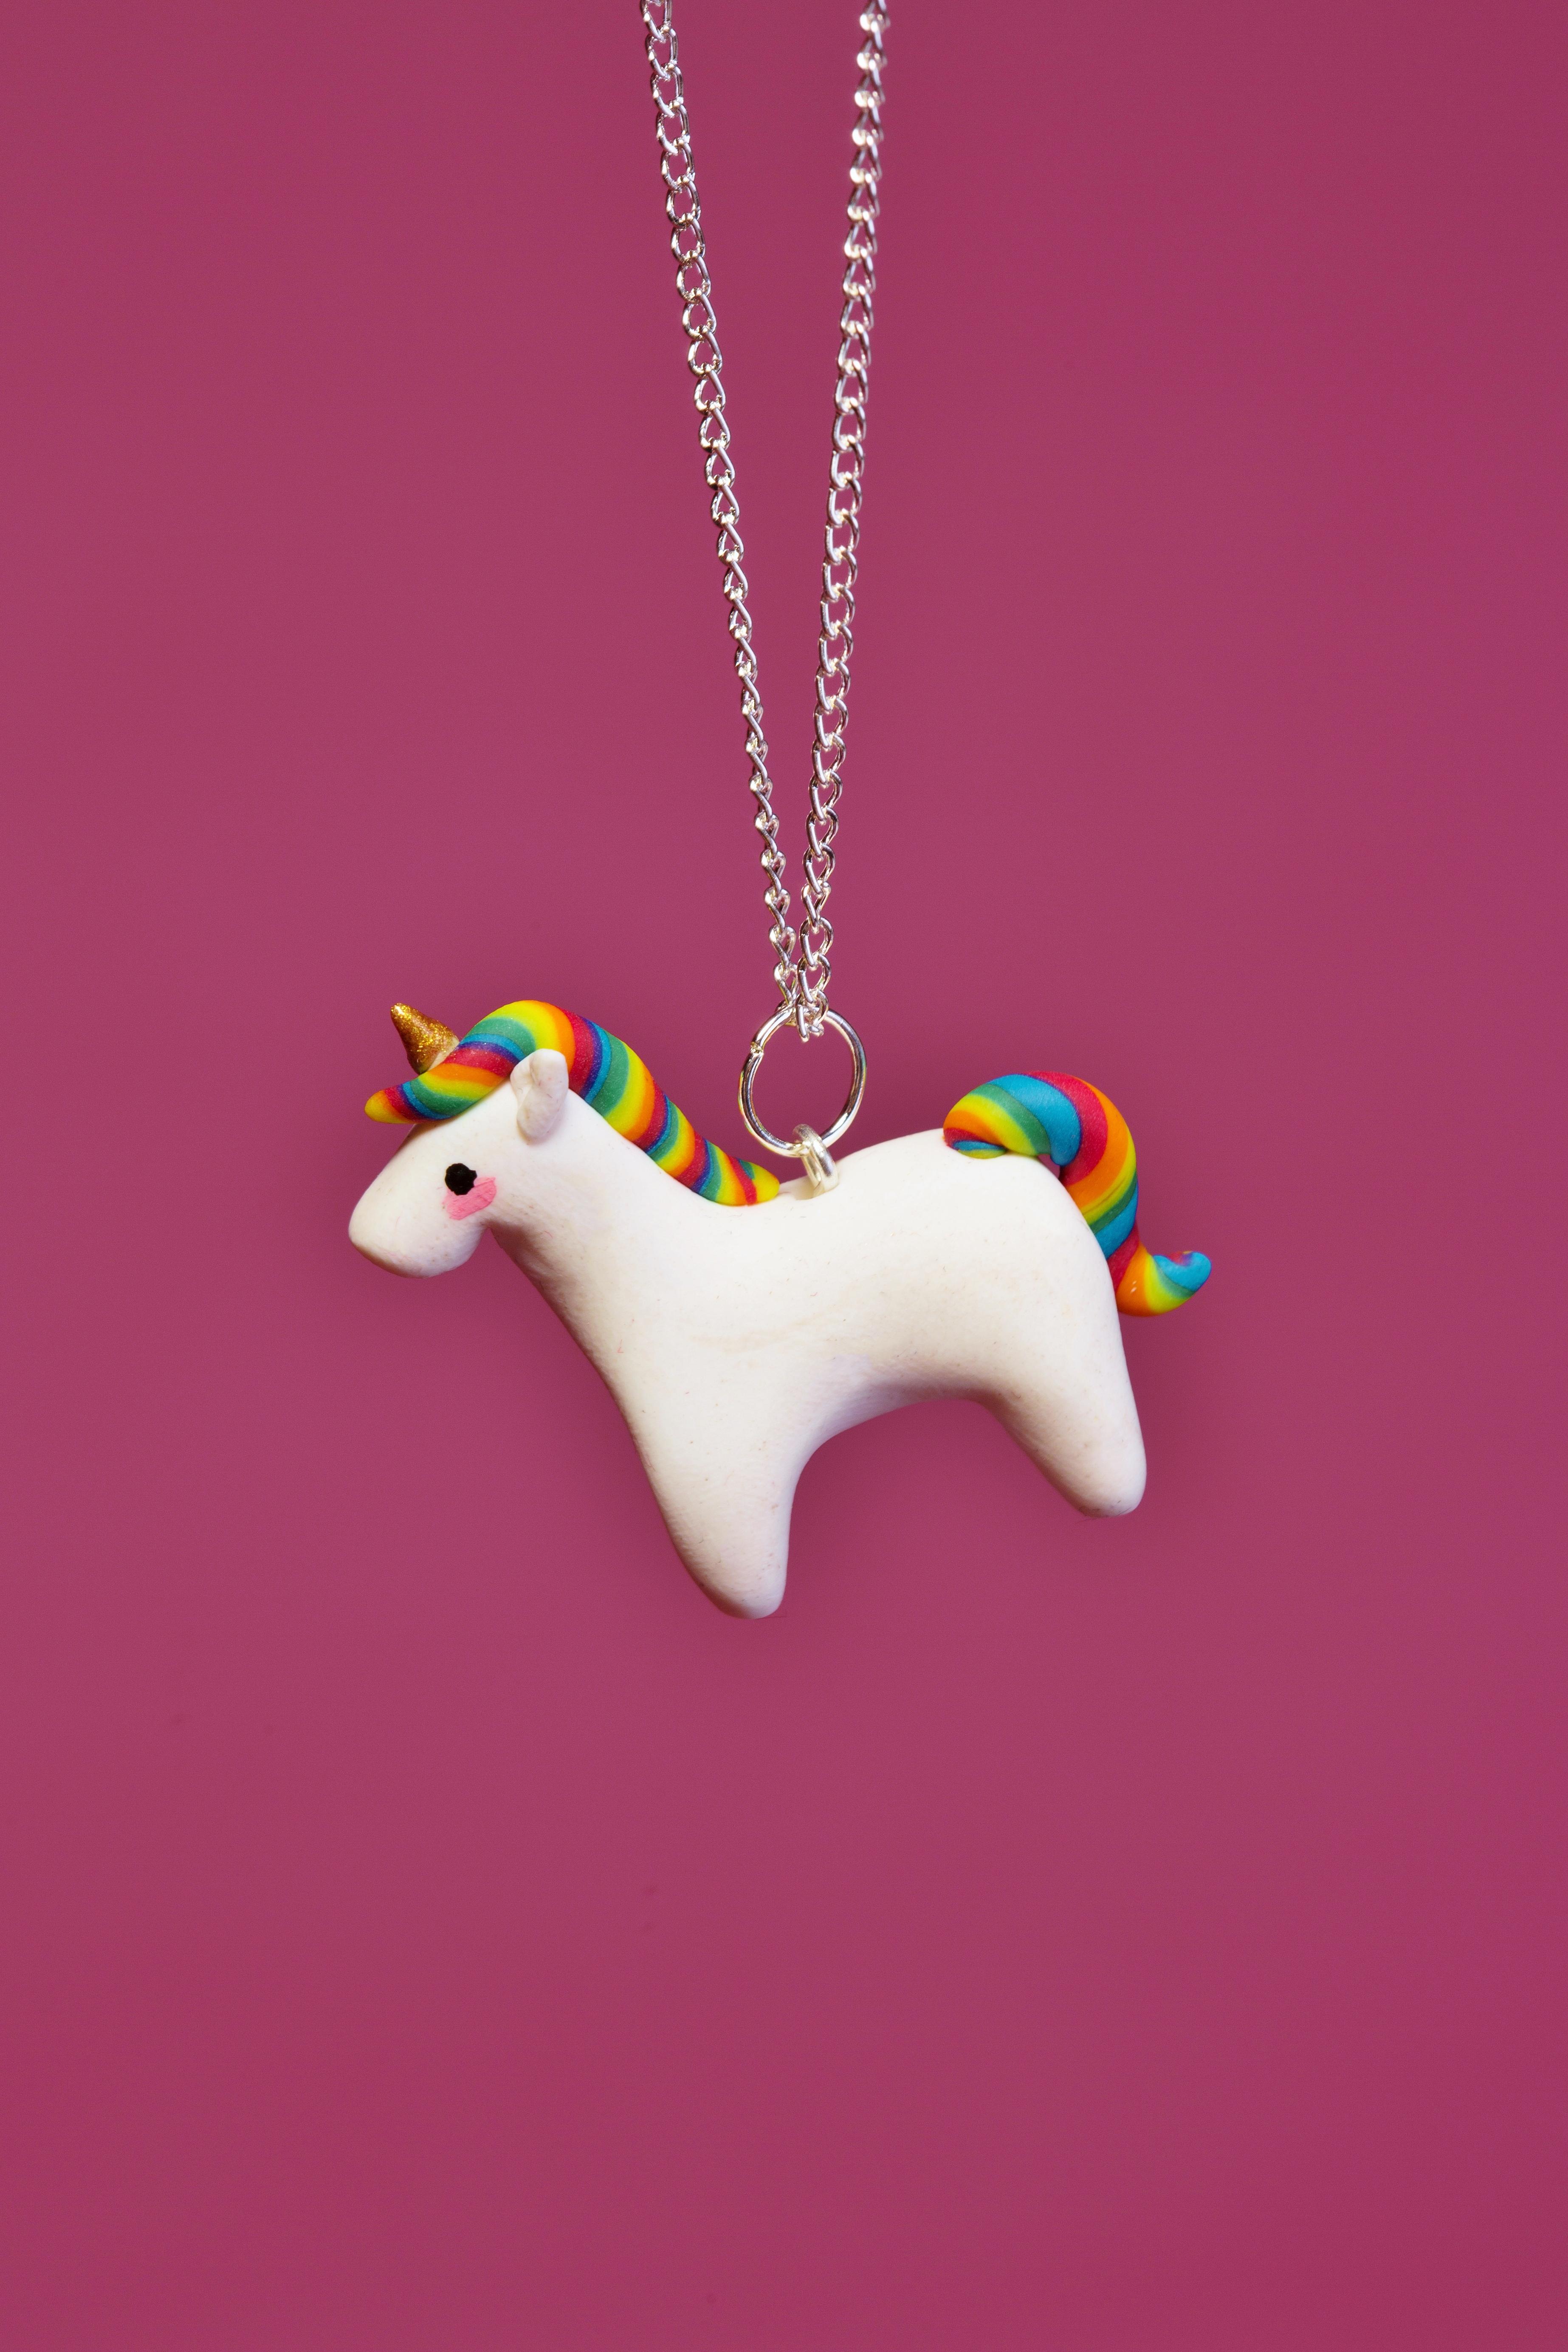 unicorn, unicorns, magical, magic, mythical, myth, mythic, glitter, shiny, cute, kawaii, chibi, pastel, gold, Pegasus, Blitz, Dash, Stardust, Twinkle, Sunshine, Moonlight, Fimo, polymer clay, handmade, kitsch, novelty, quirky, jewellery, jewelry, accessories, fashion, style, necklace, charm,